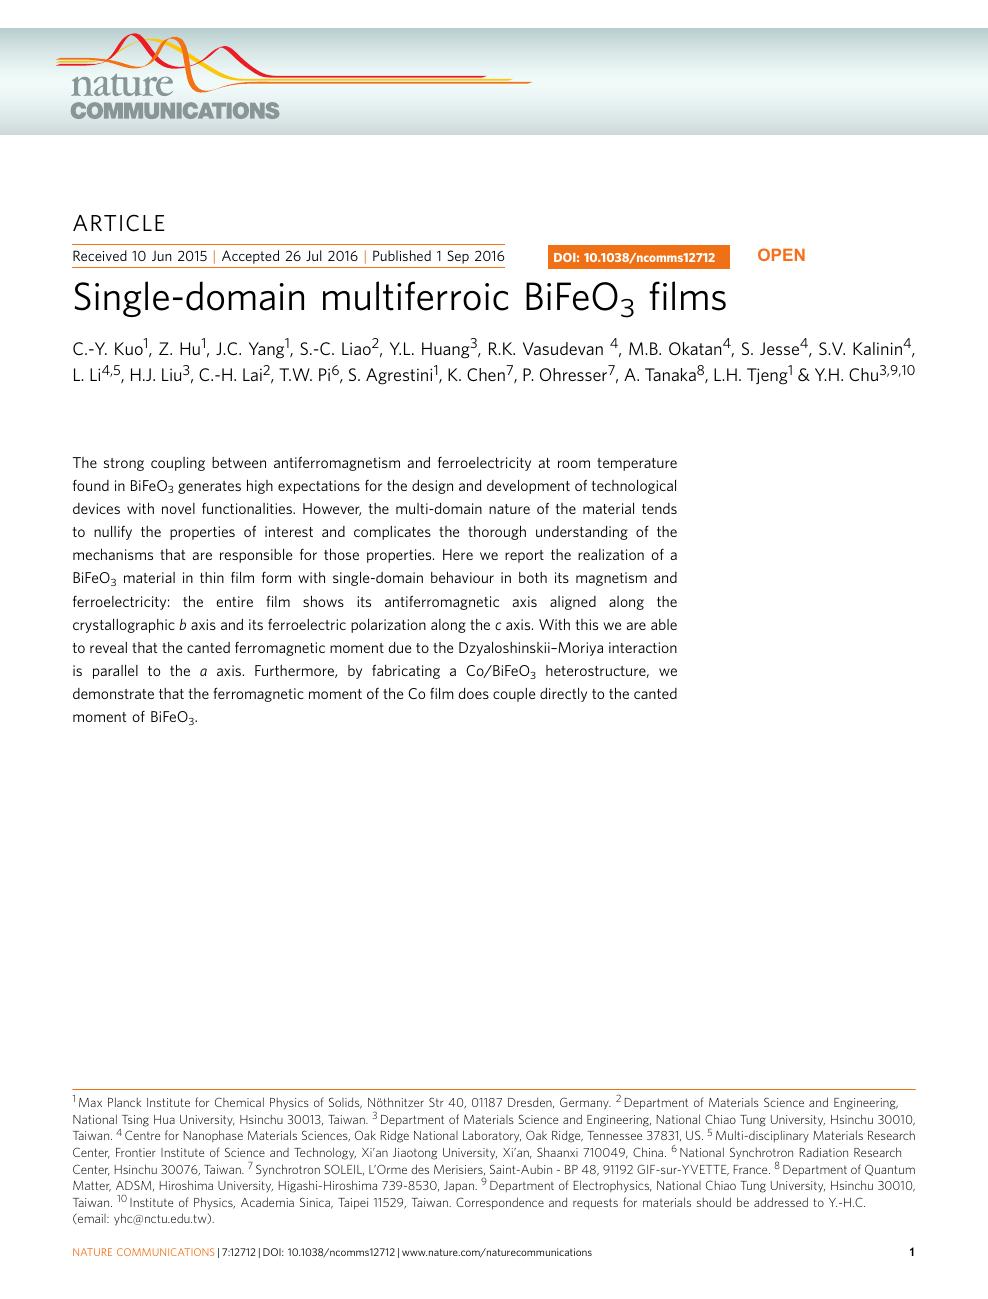 Single-domain multiferroic BiFeO3 films – topic of research